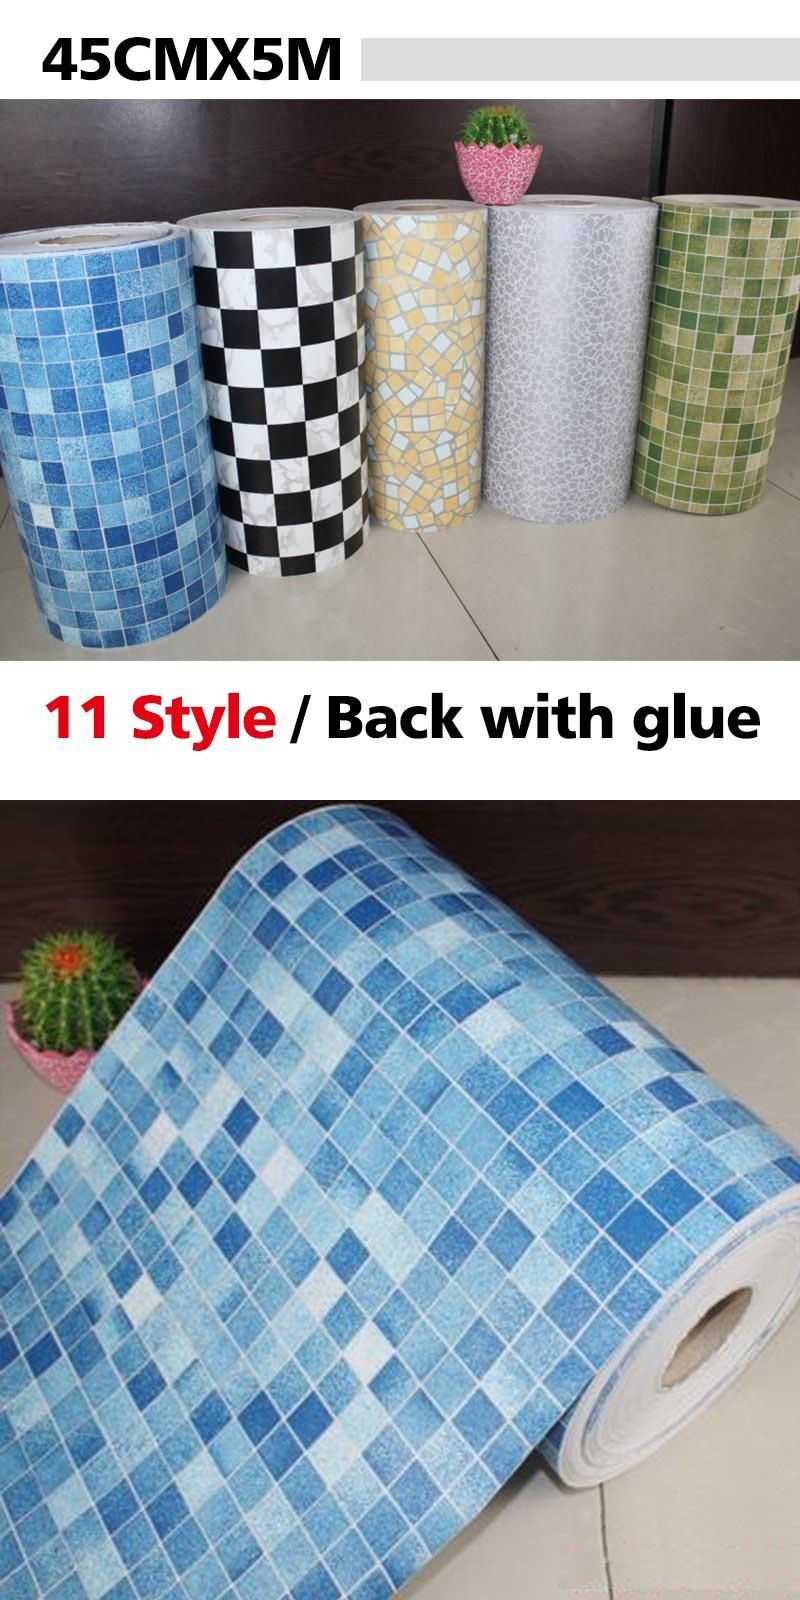 Visit To Buy 5 Meters Vinyl Pvc Mosaic Tile Self Adhesive Wallpaper For Bathroom Wc Kitch Self Adhesive Wallpaper Wall Stickers Home Decor Bathroom Wallpaper